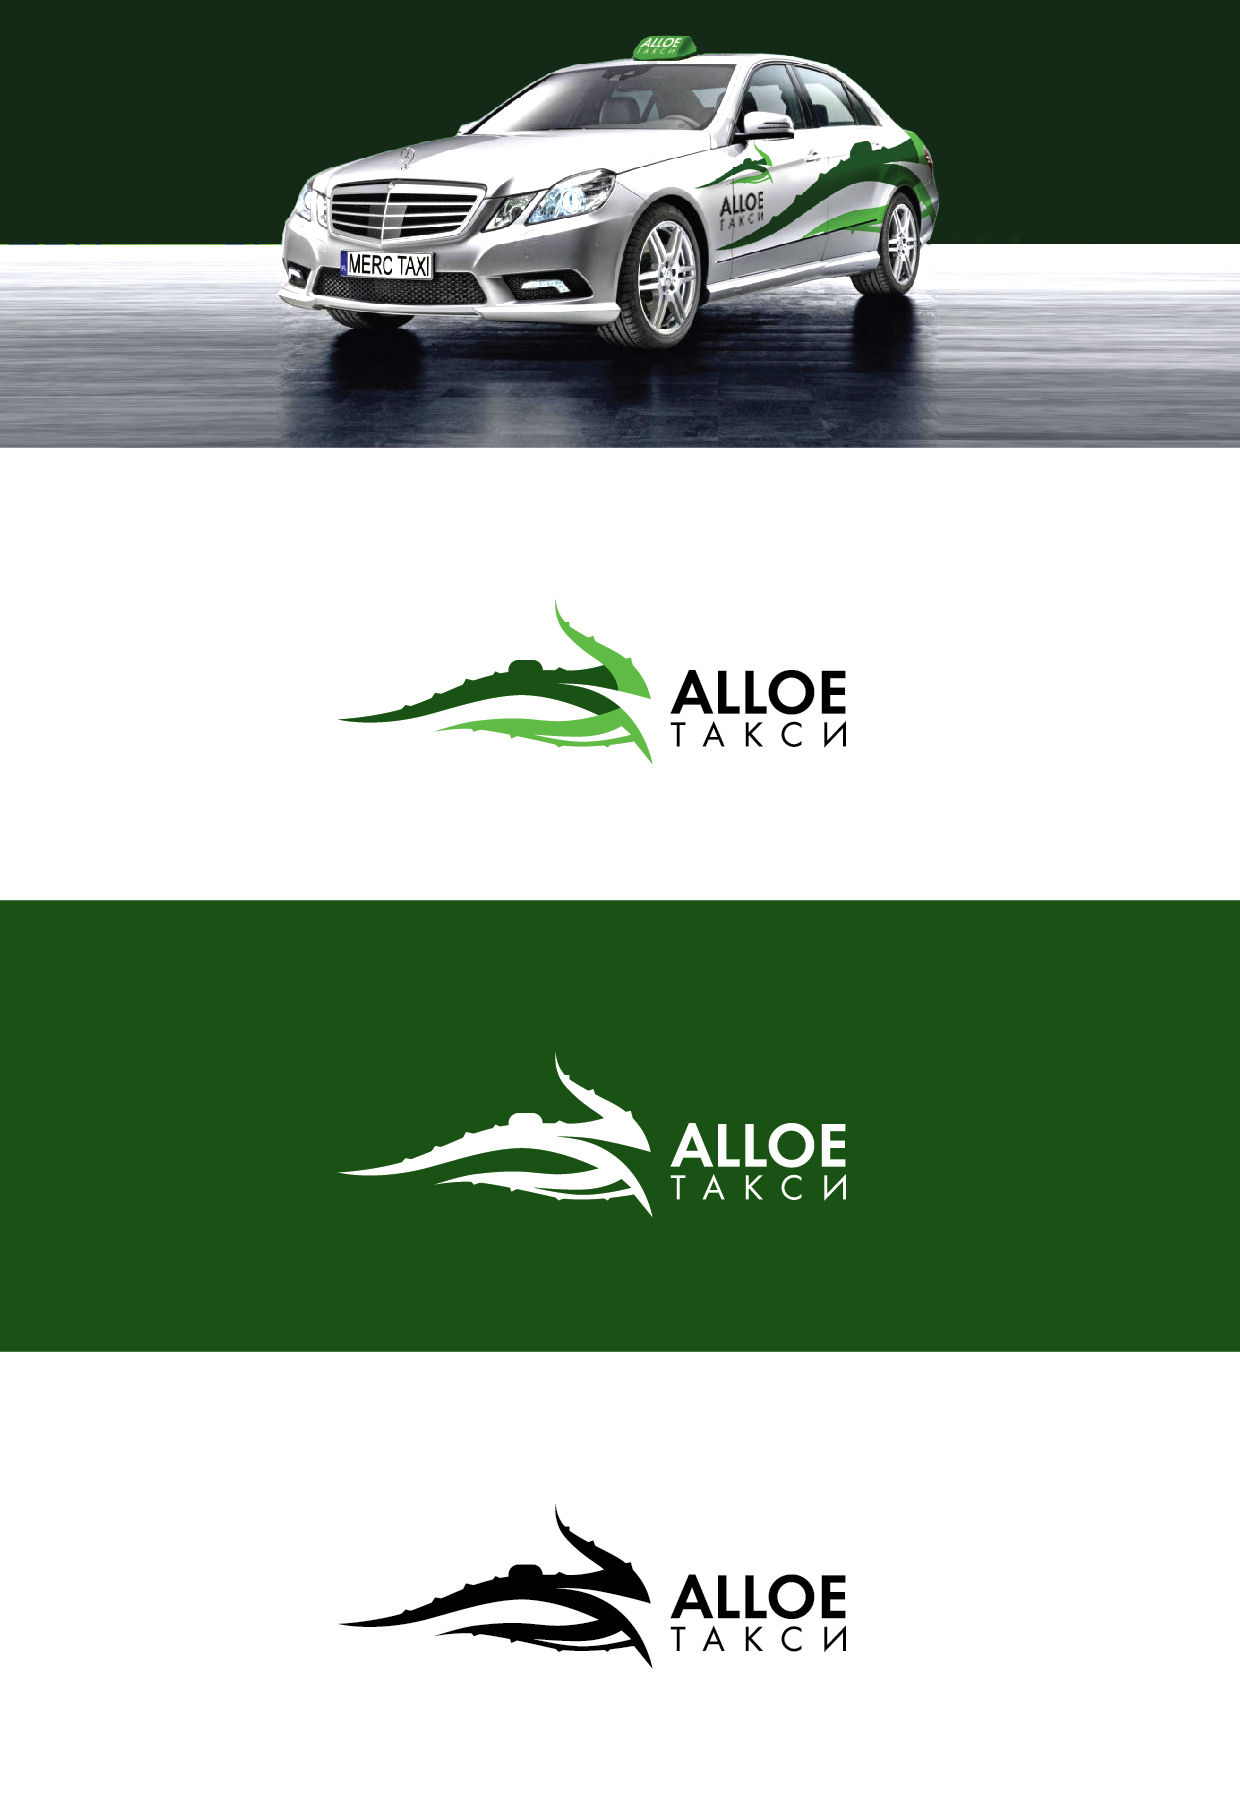 придумать логотип для такси фото f_53053a14ecc9d588.jpg